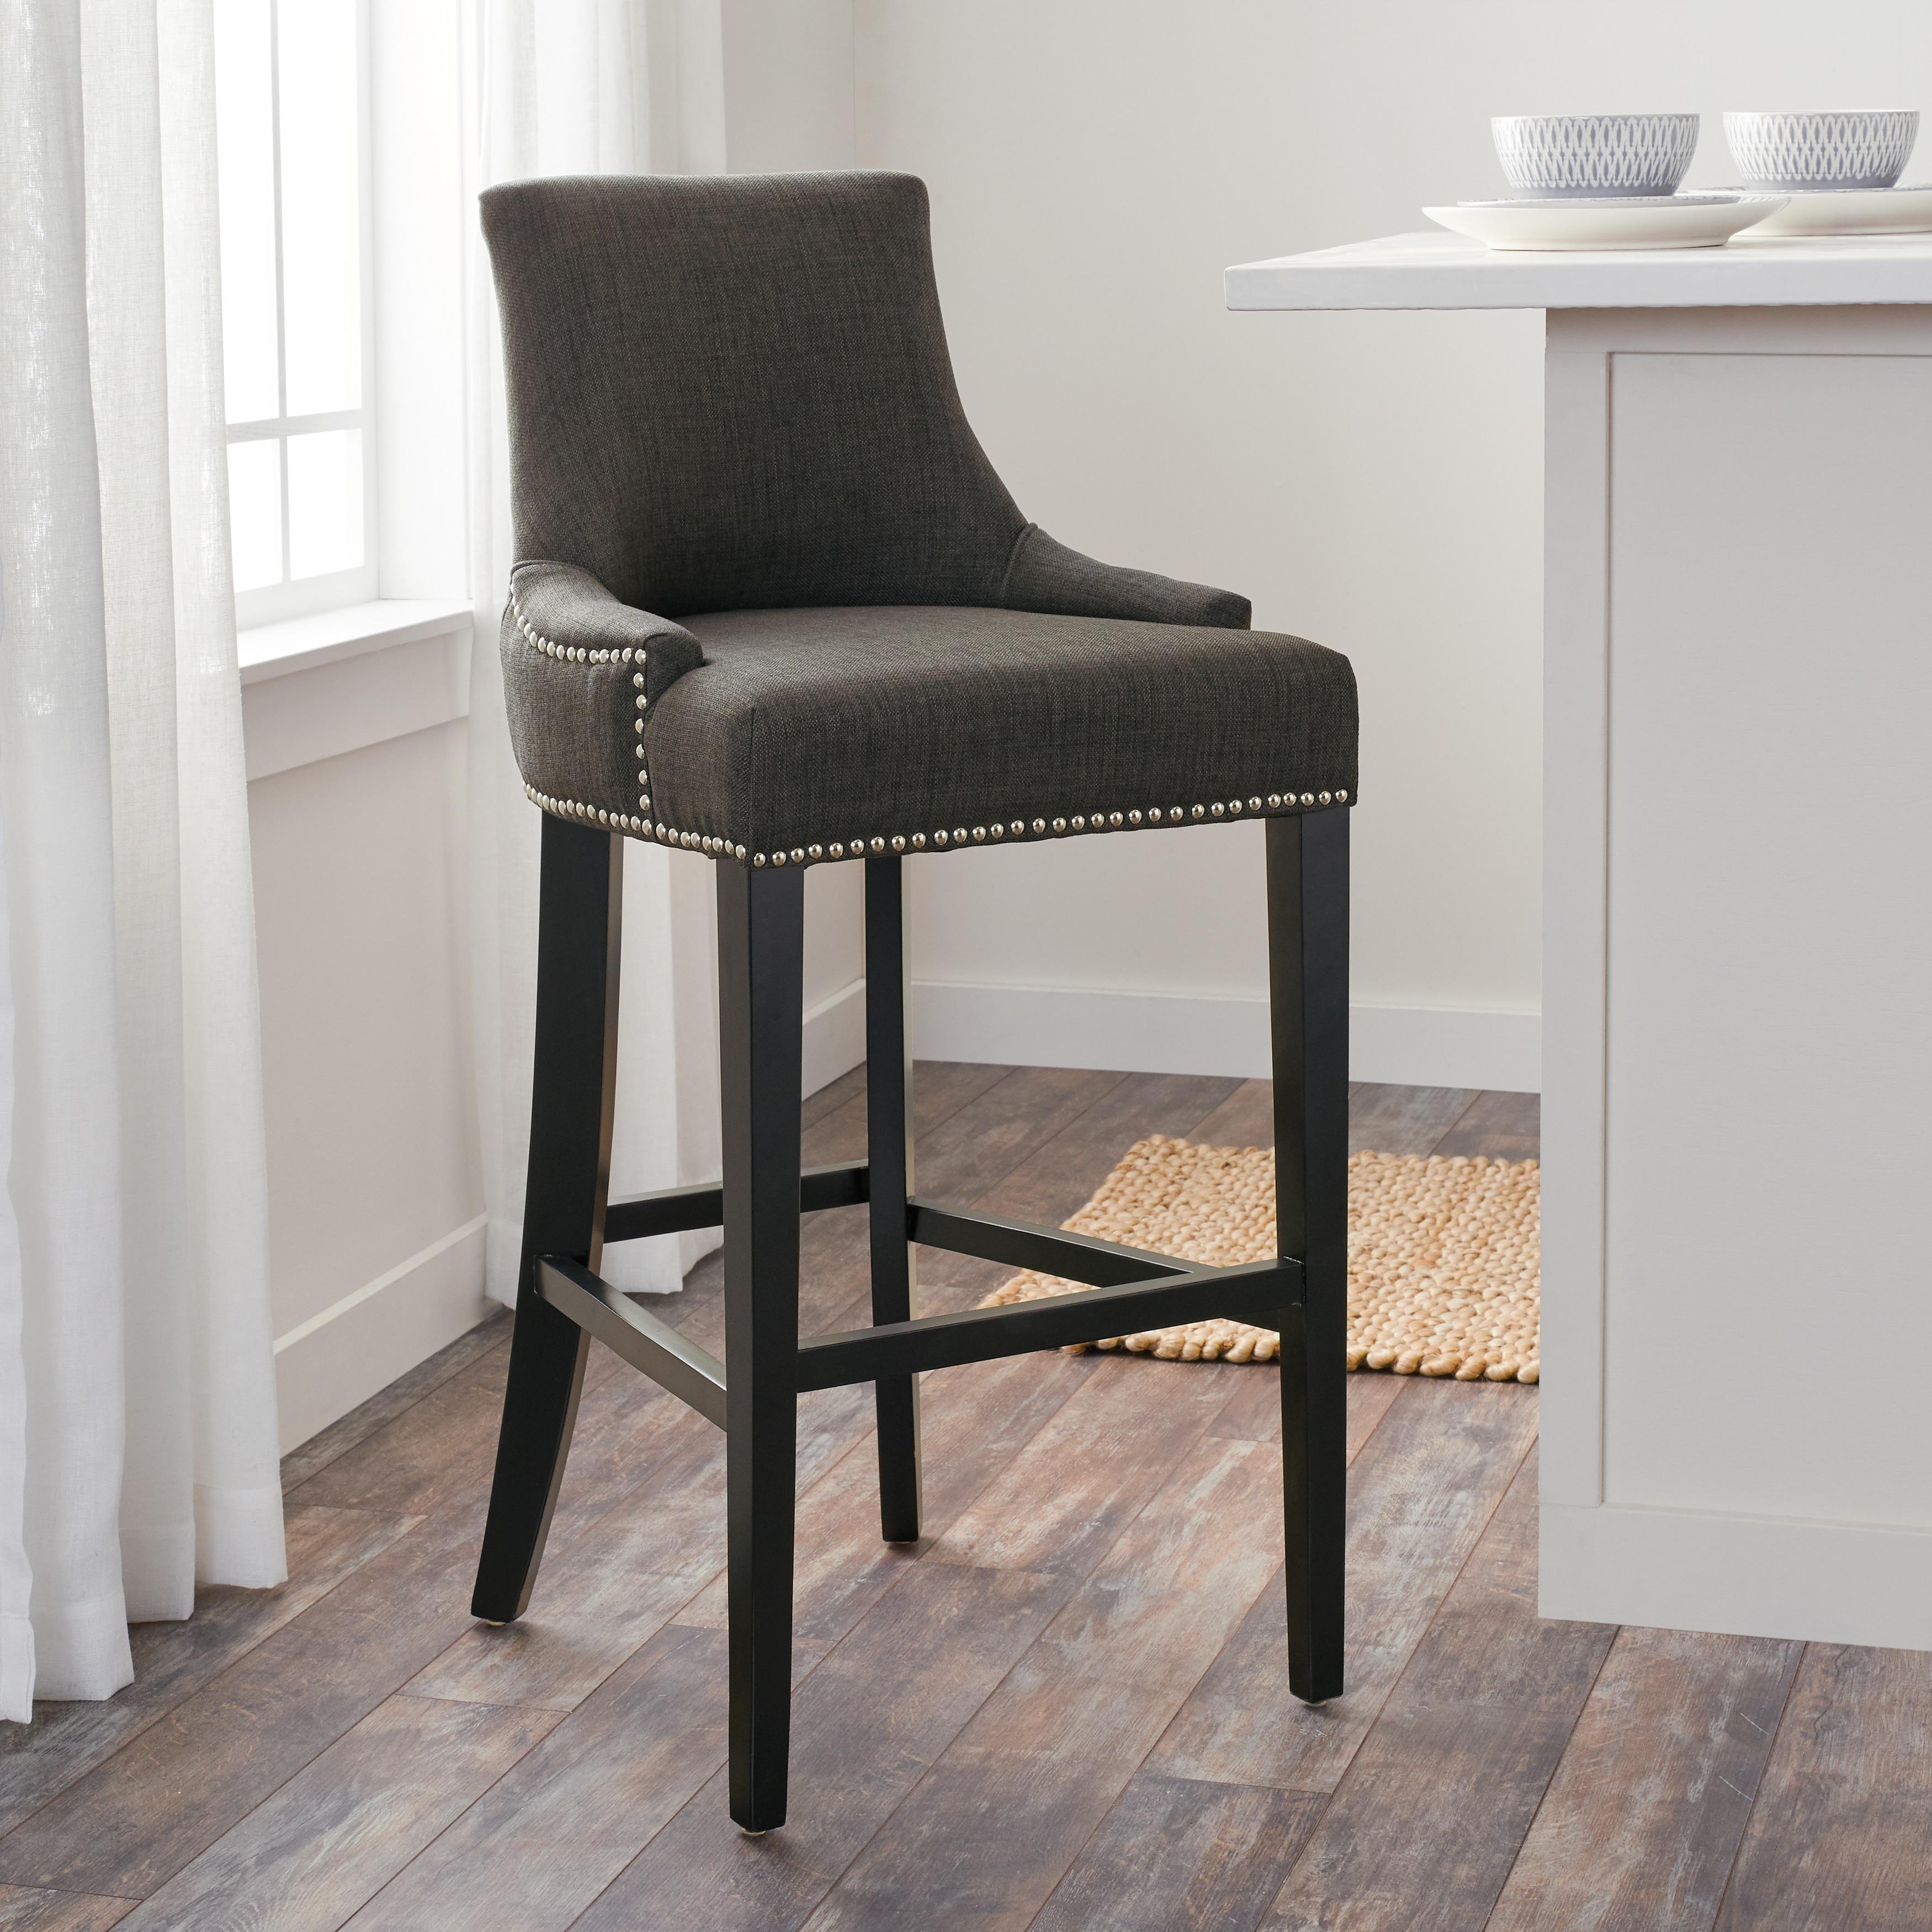 Magnificent Abbyson Newport 30 Inch Grey Fabric Nailhead Trim Bar Stool Inzonedesignstudio Interior Chair Design Inzonedesignstudiocom